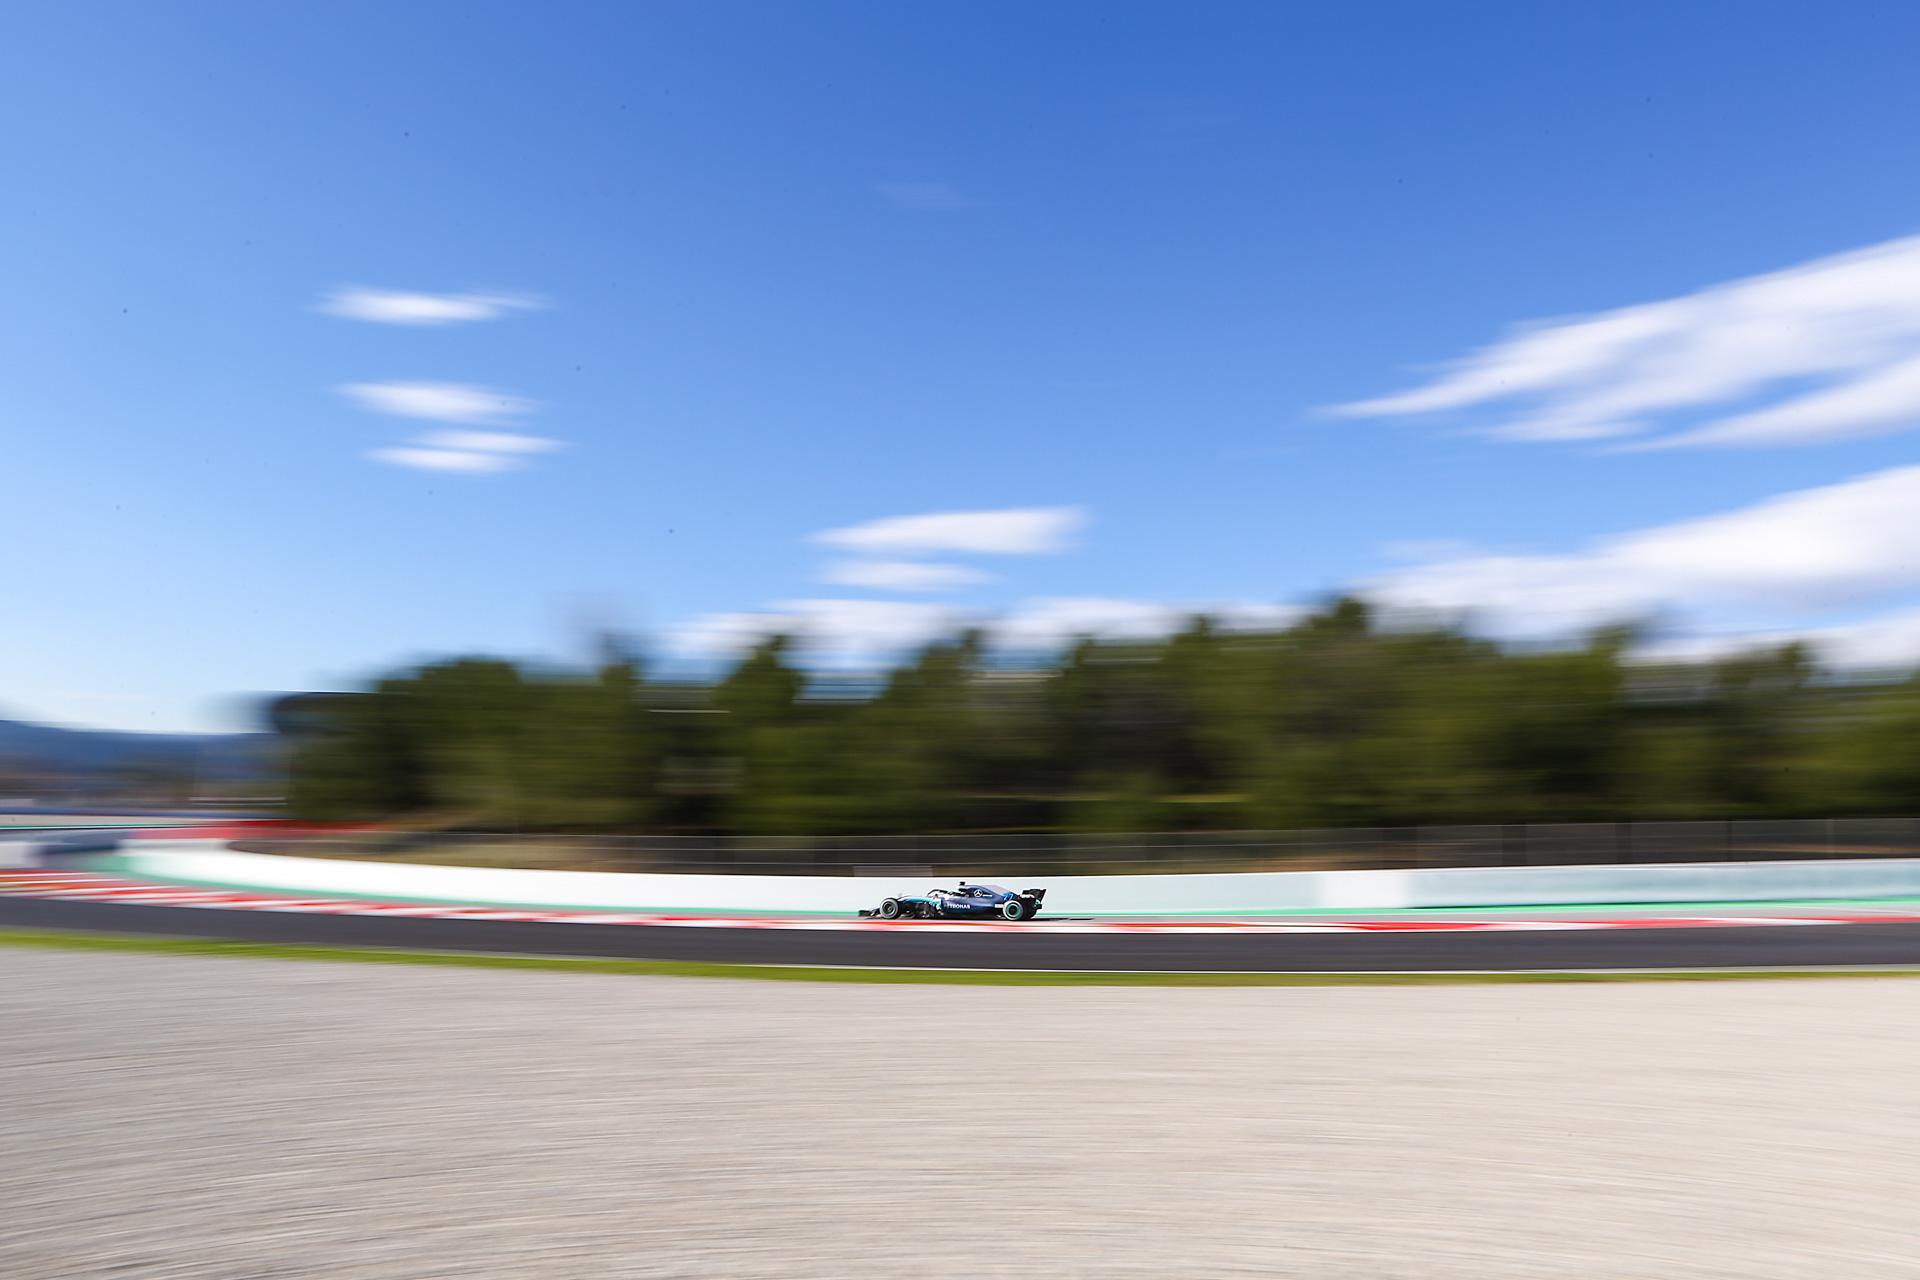 - F1 Test Days - Circuit de Barcelona Catalunya - Spain - 06 March 2018